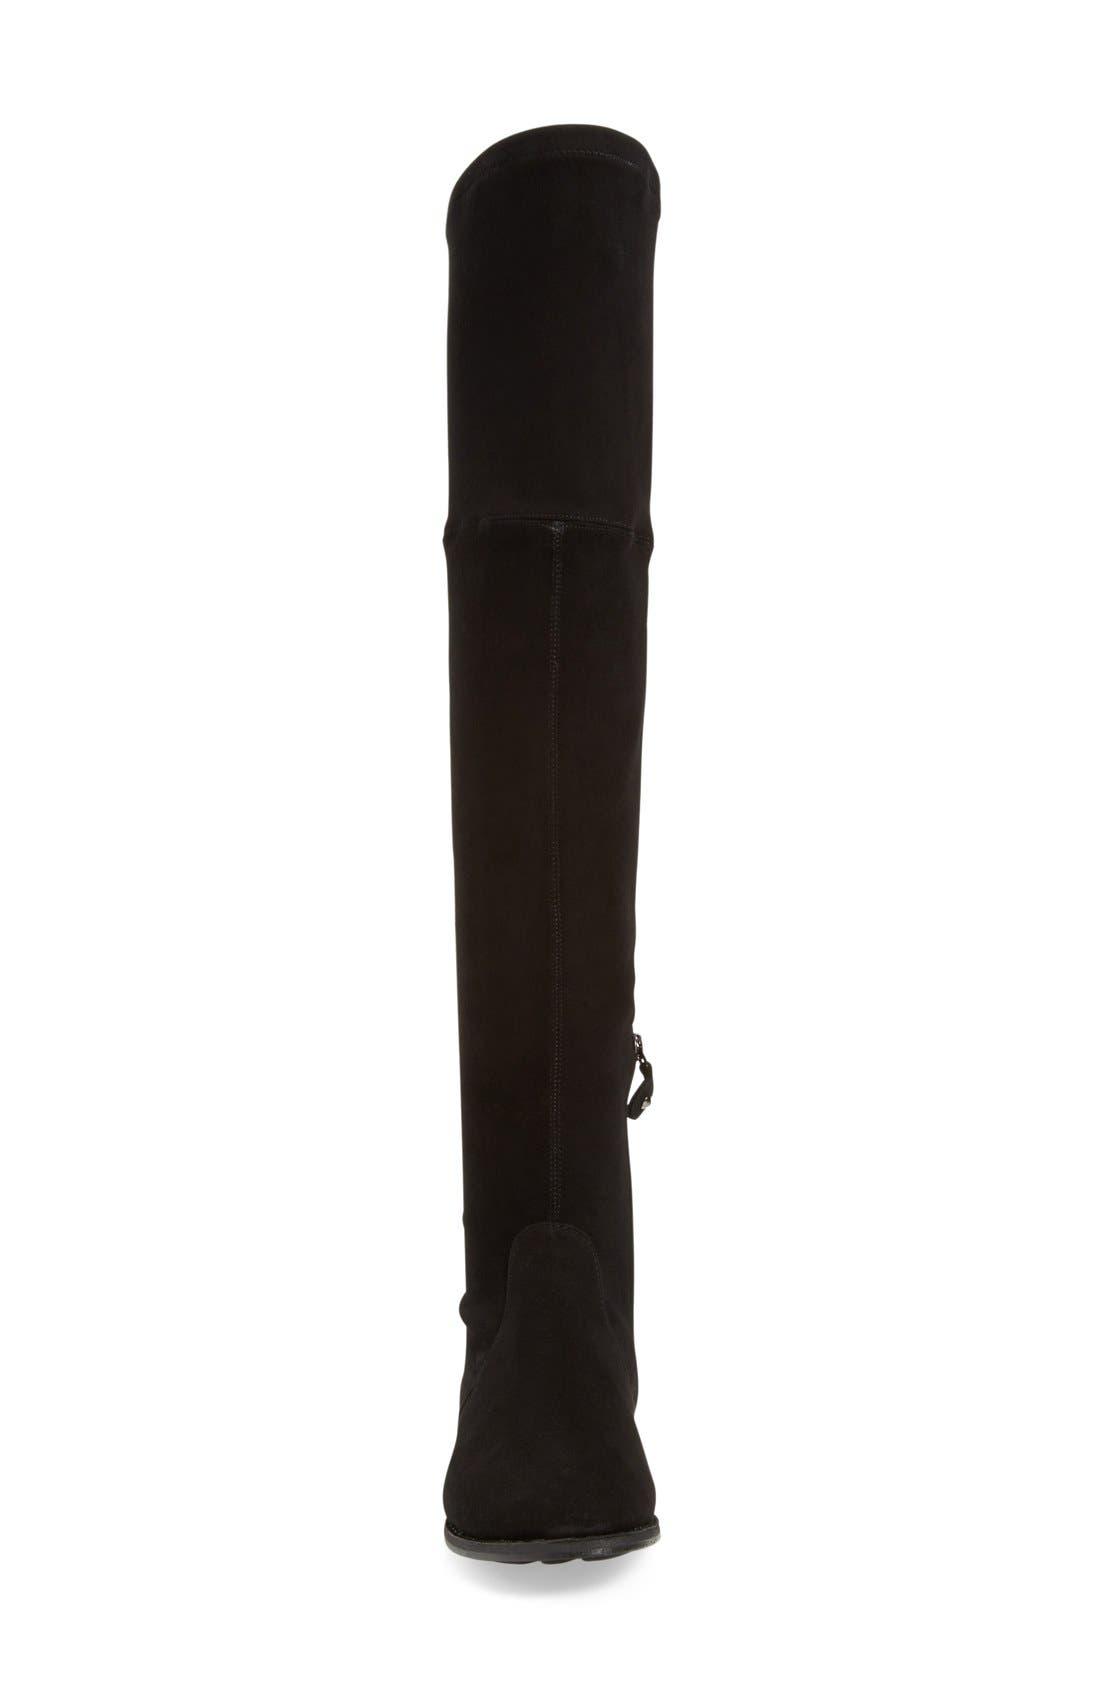 Alternate Image 3  - Gentle Souls 'Emma' Over the Knee Boot (Women) (Narrow Calf)